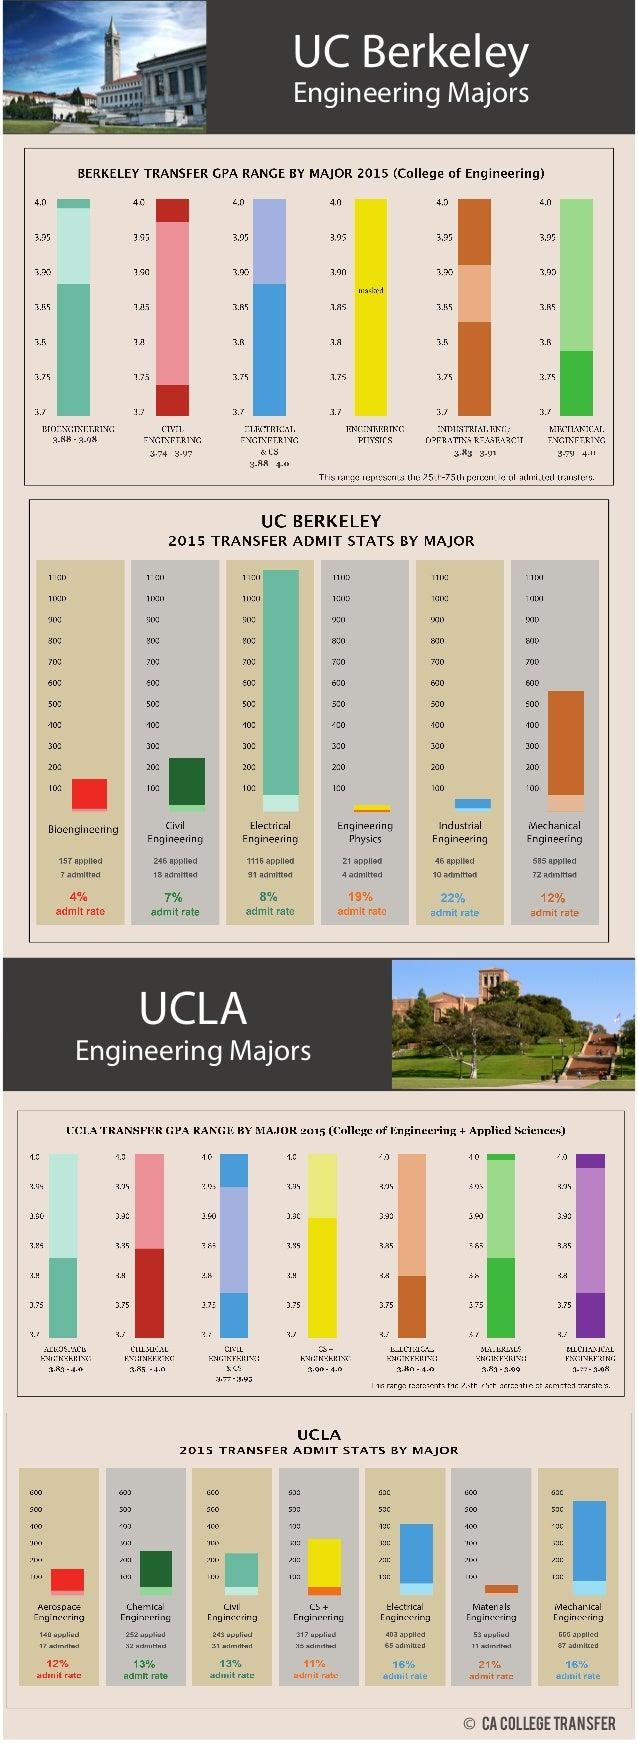 UC Berkeley Engineering Majors UCLA Engineering Majors © CA collegetransfer